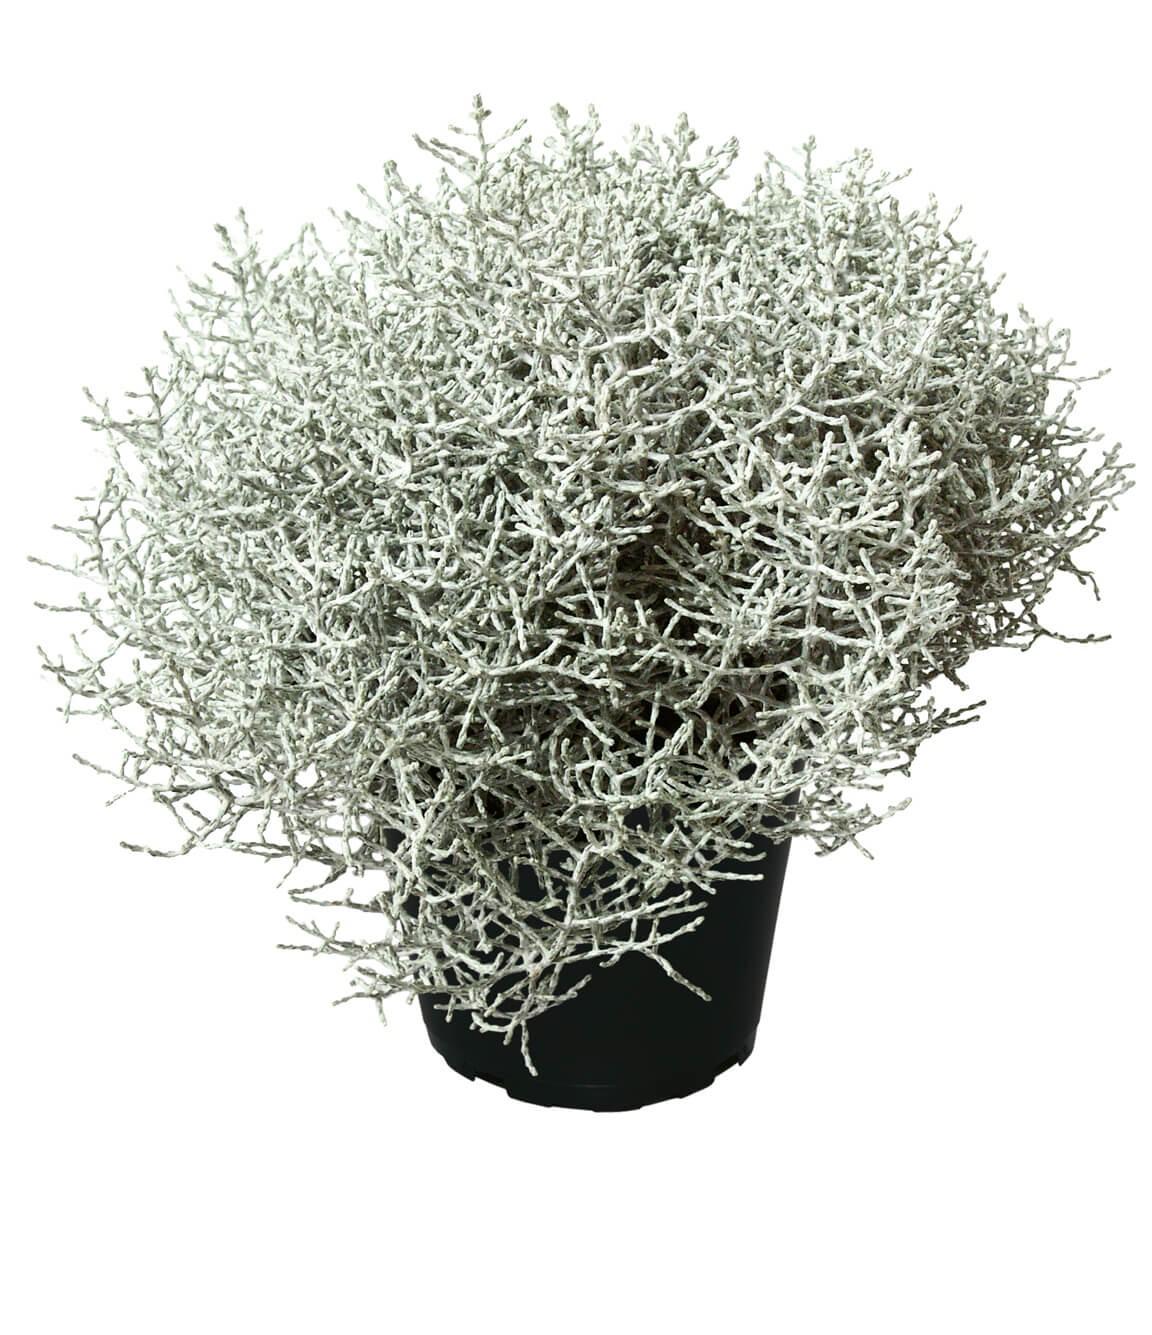 Stacheldrahtpflanze (Calocephalus brownii) T12